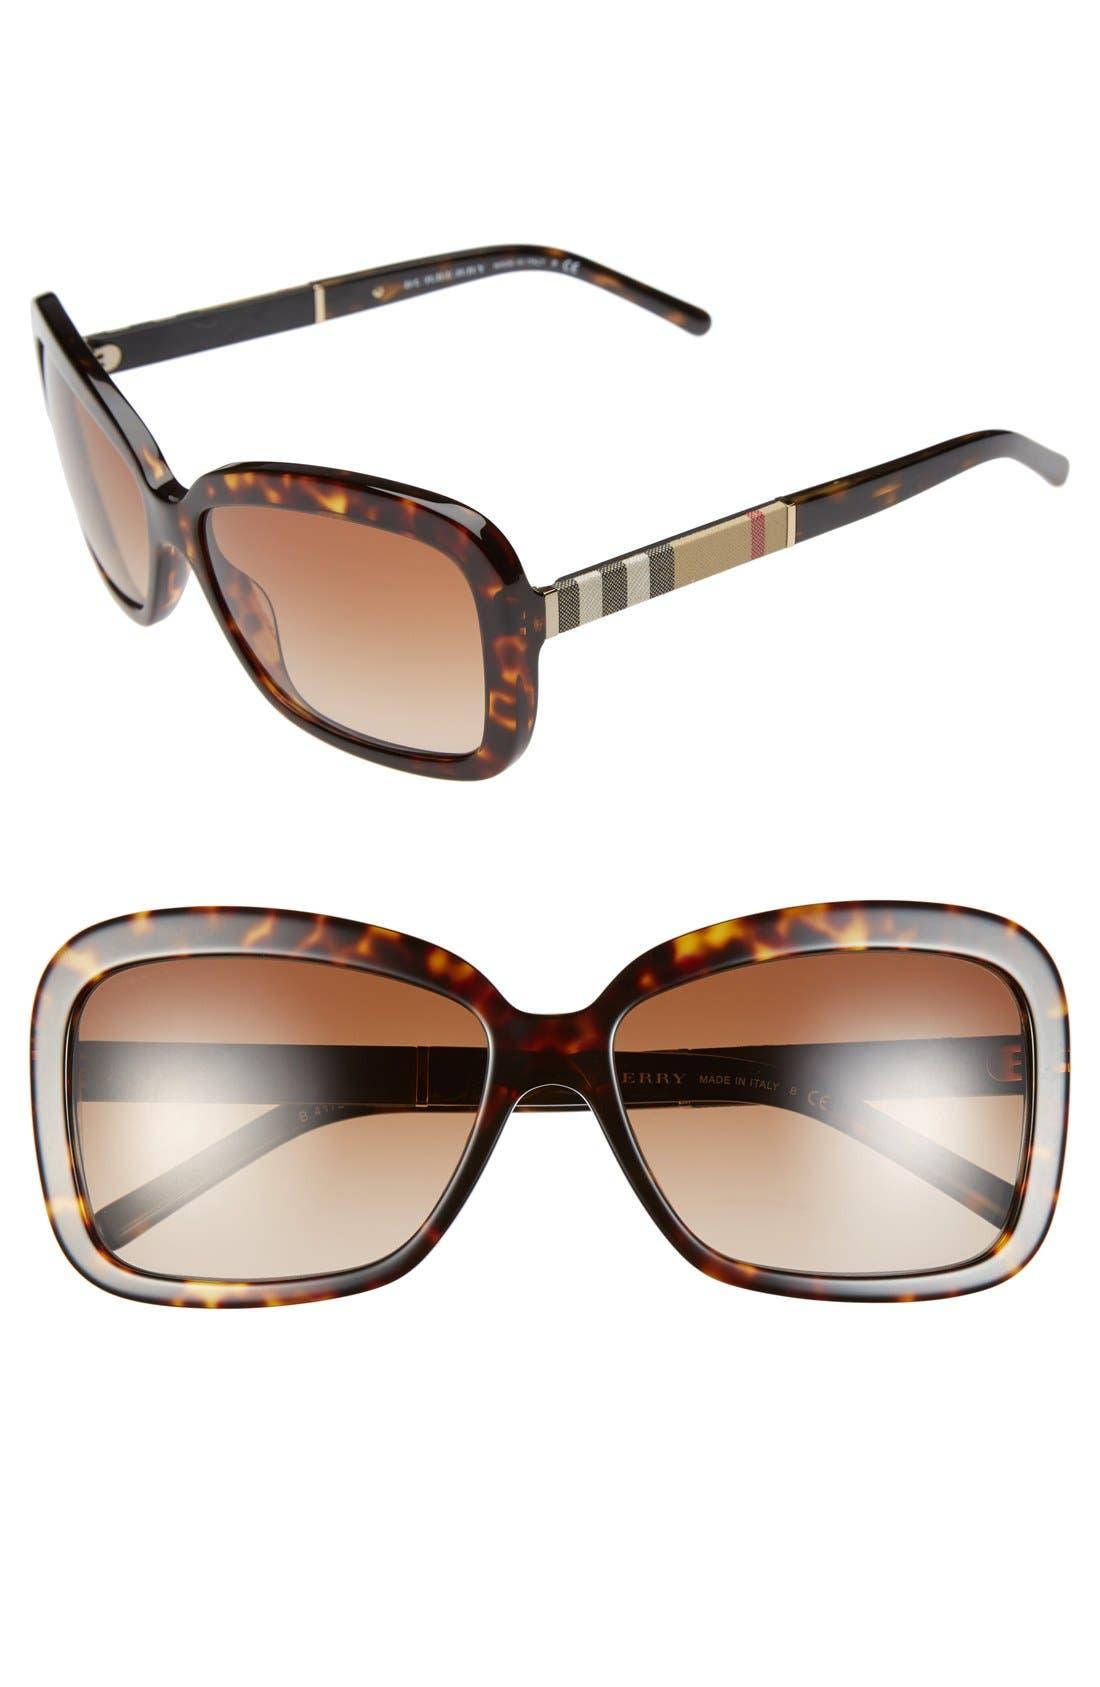 Alternate Image 1 Selected - Burberry 58mm Retro Sunglasses